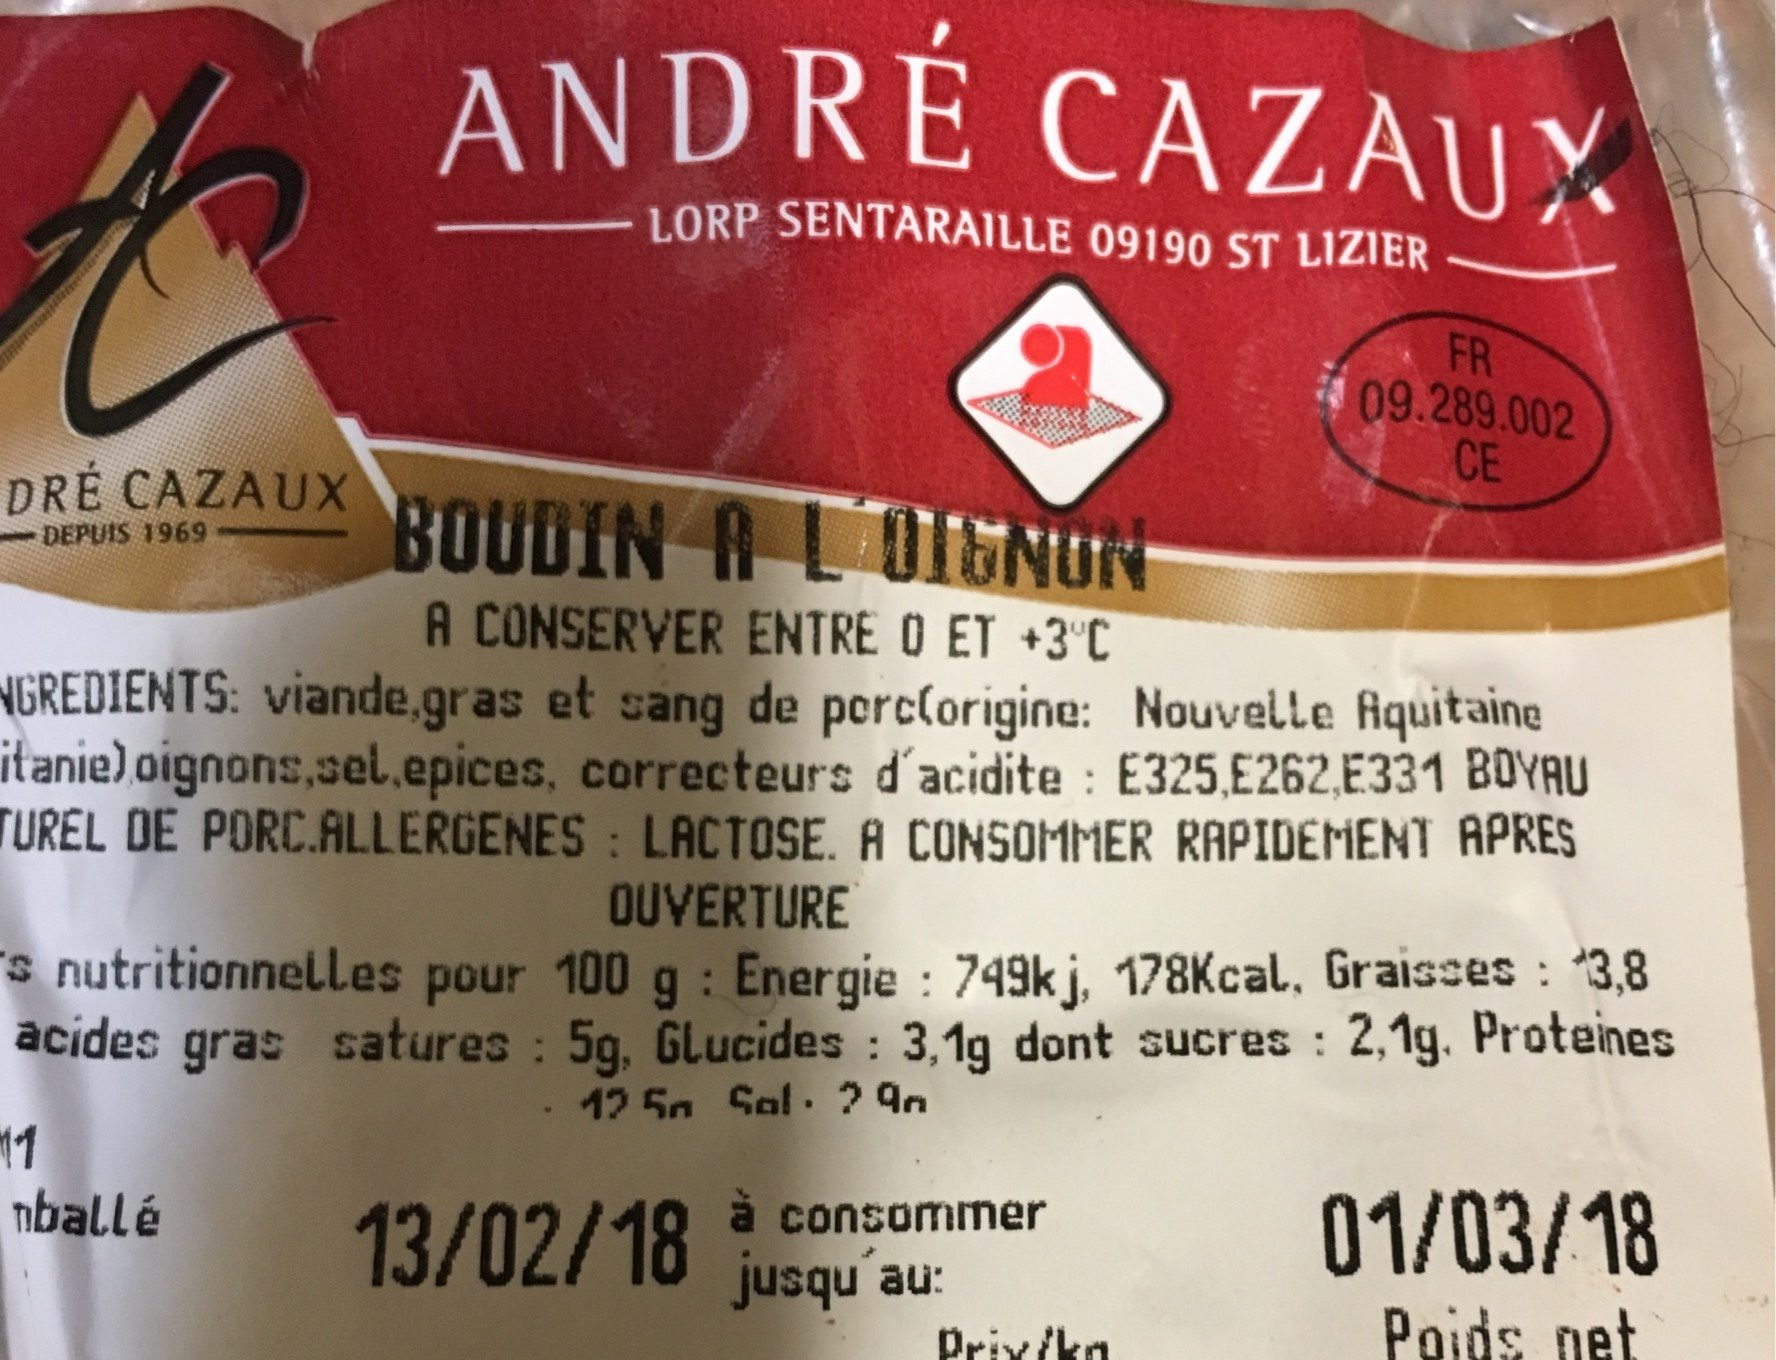 Boudin a l'oignon - Produit - fr